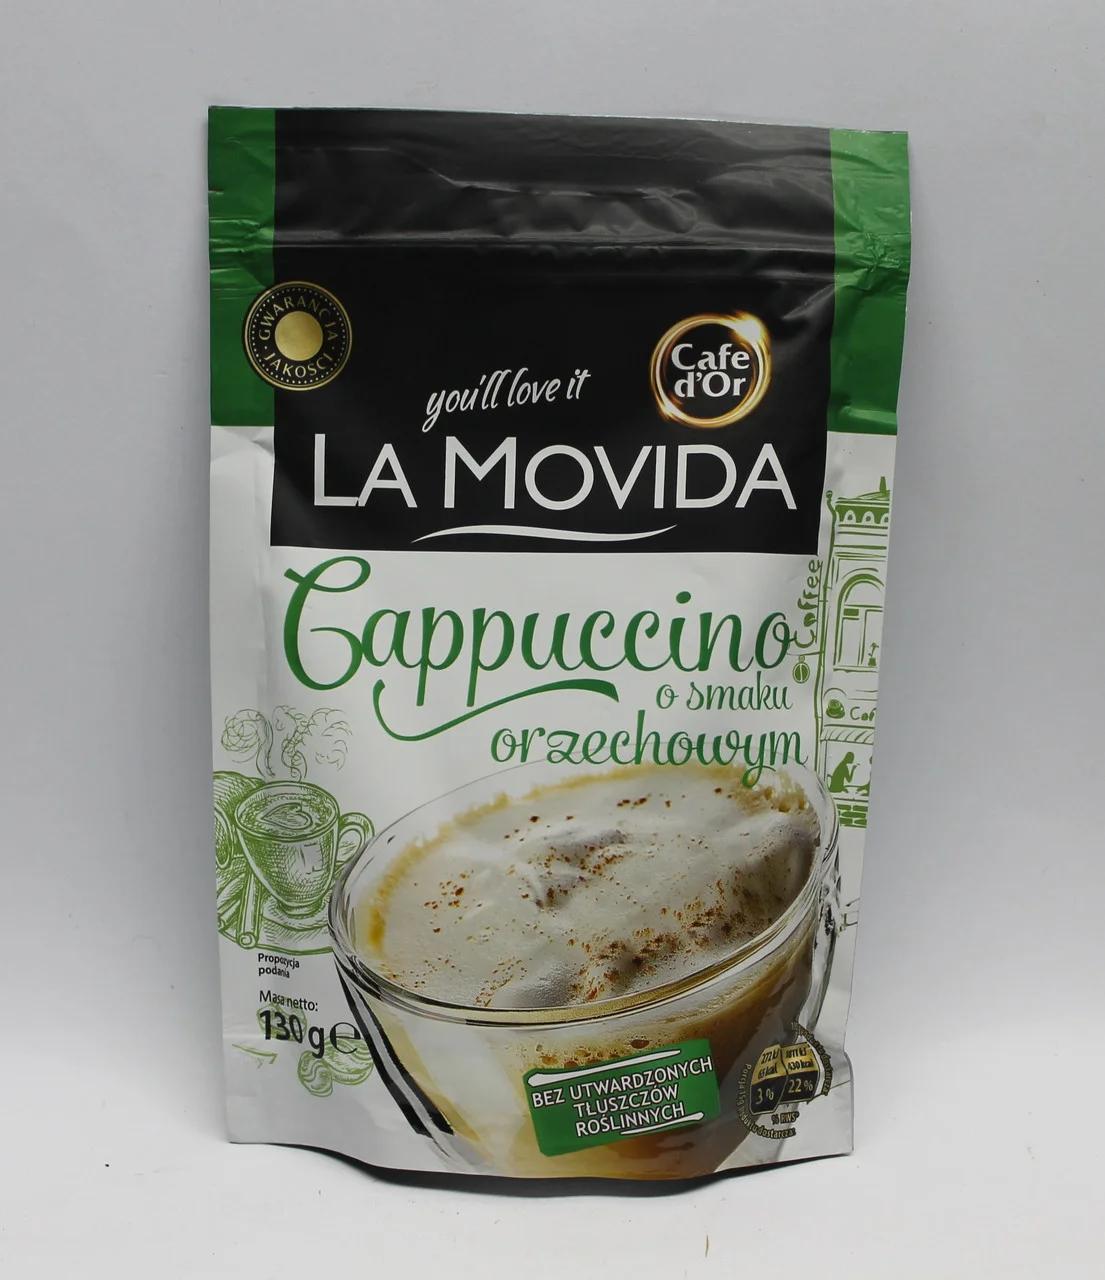 Капучіно Сafe d'or la movida горіх 130 г